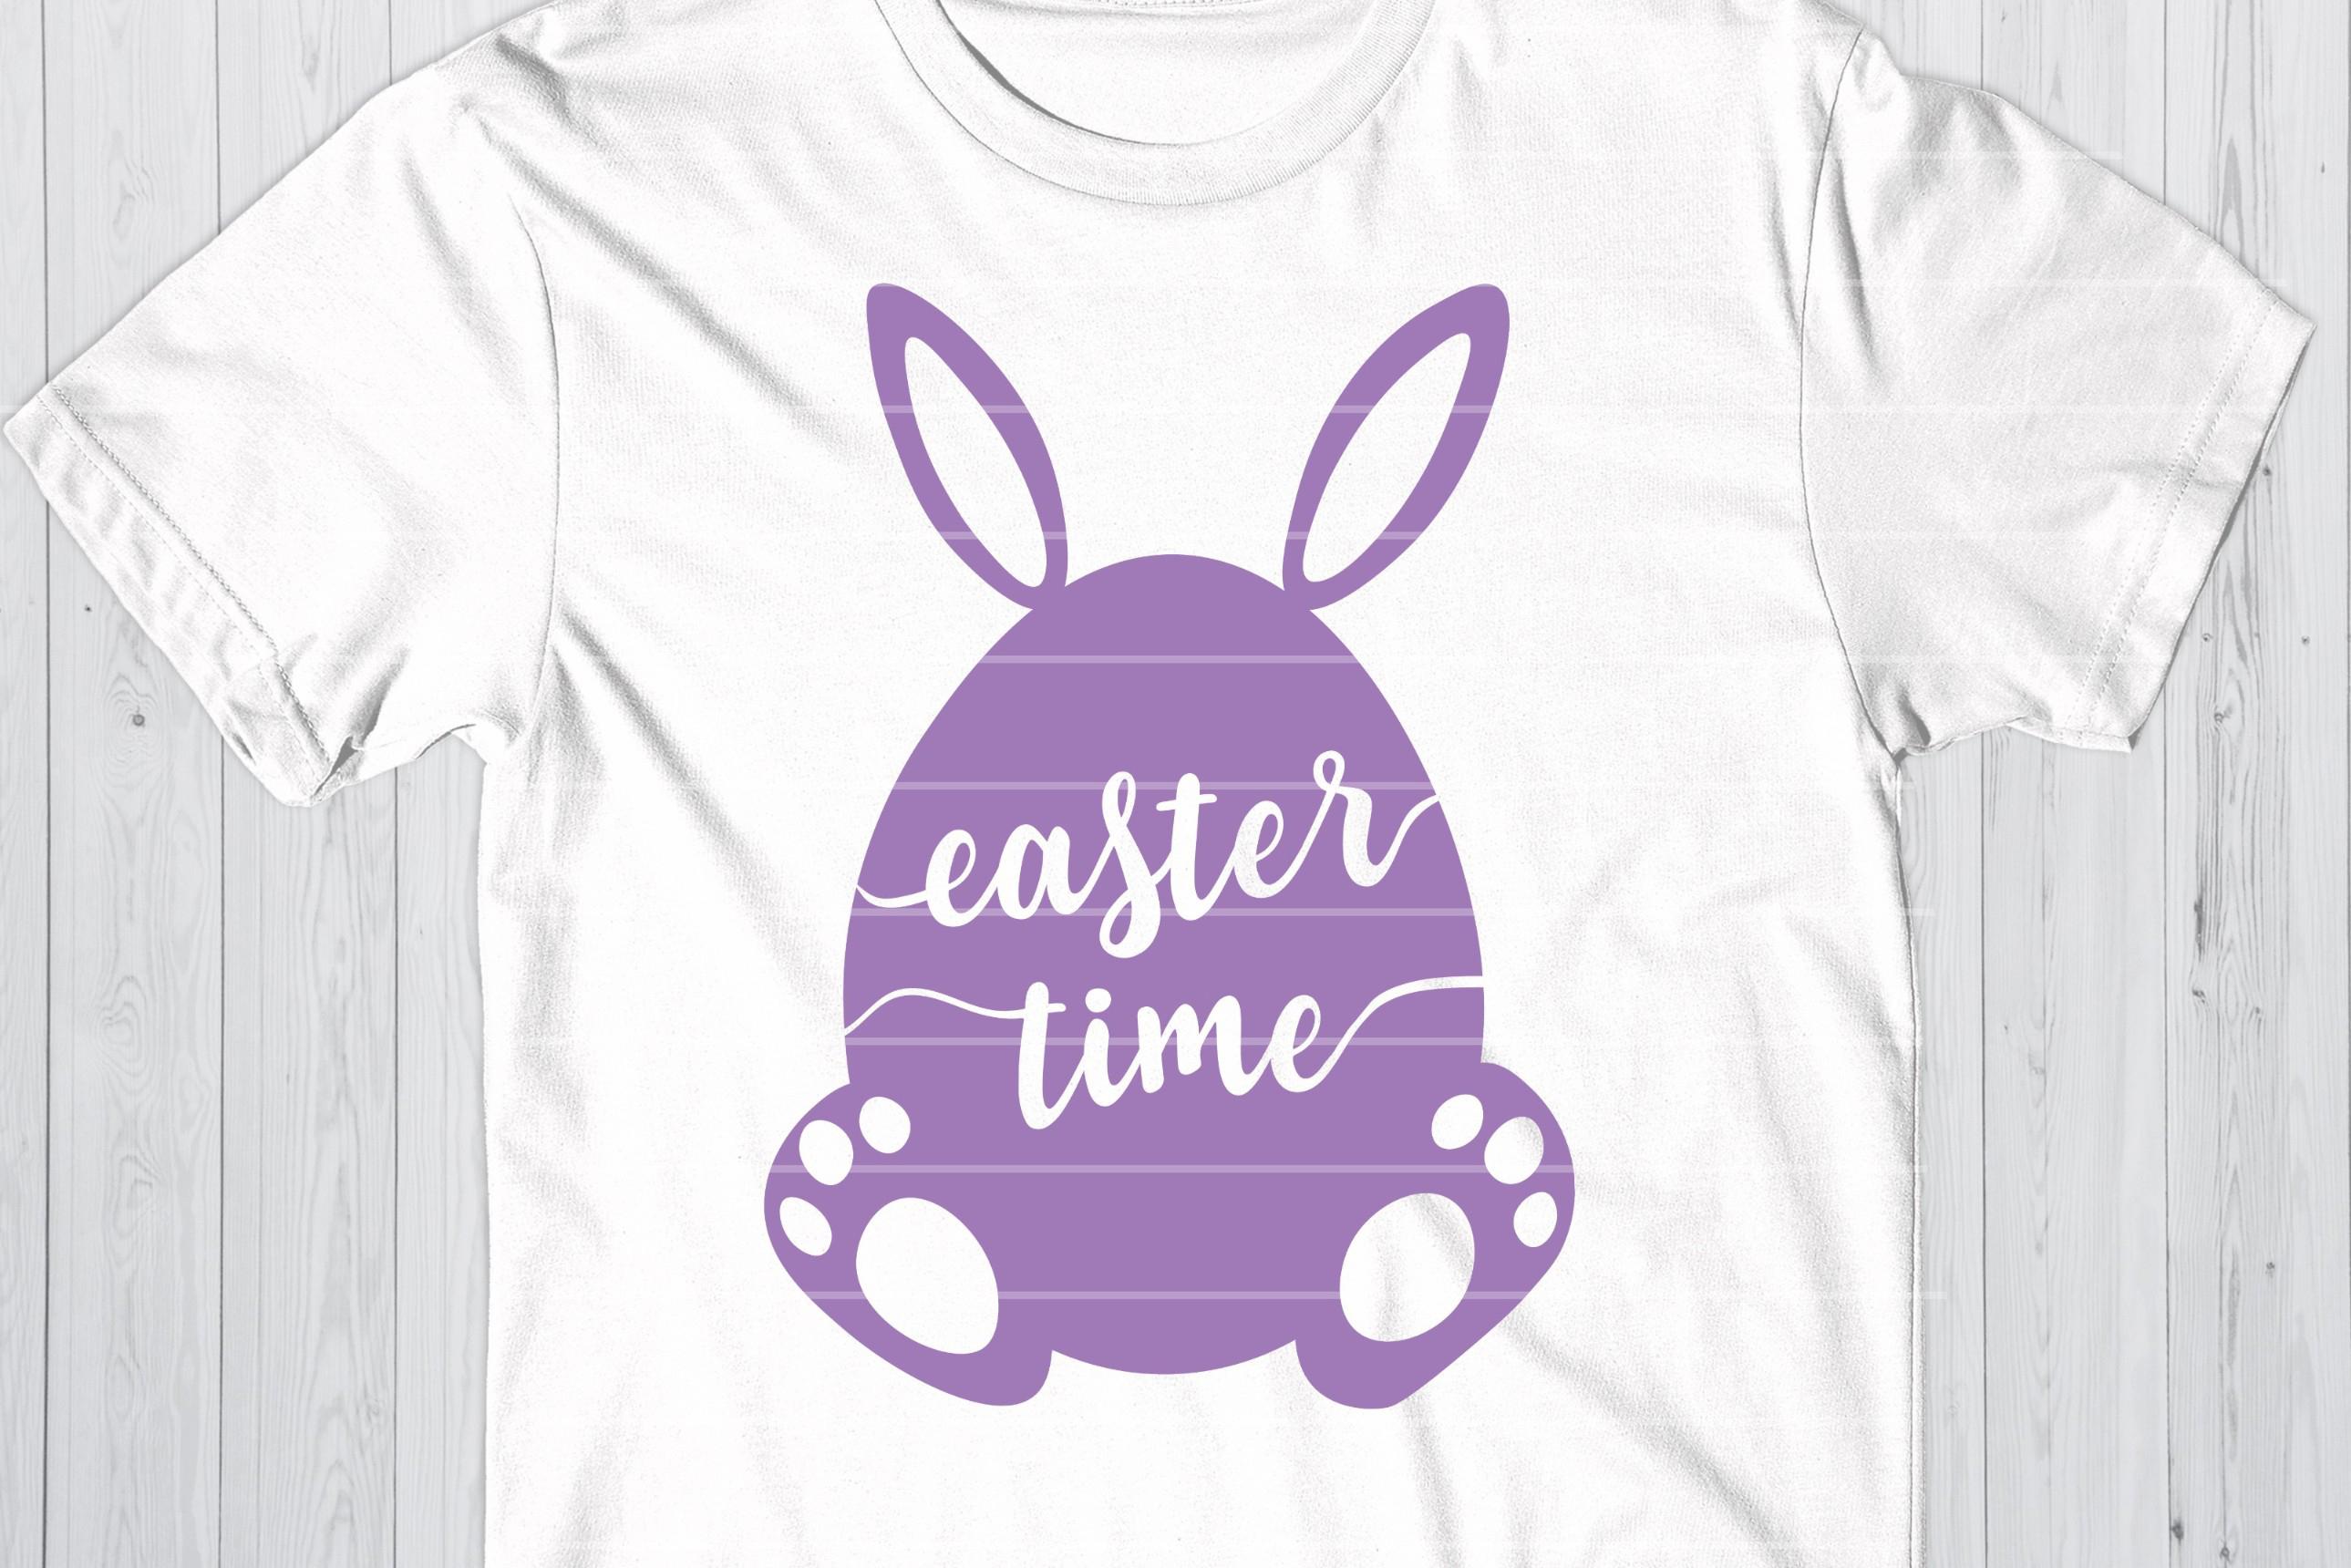 Easter Time SVG, Easter Bunny Cut File, Easter Egg SVG example image 1